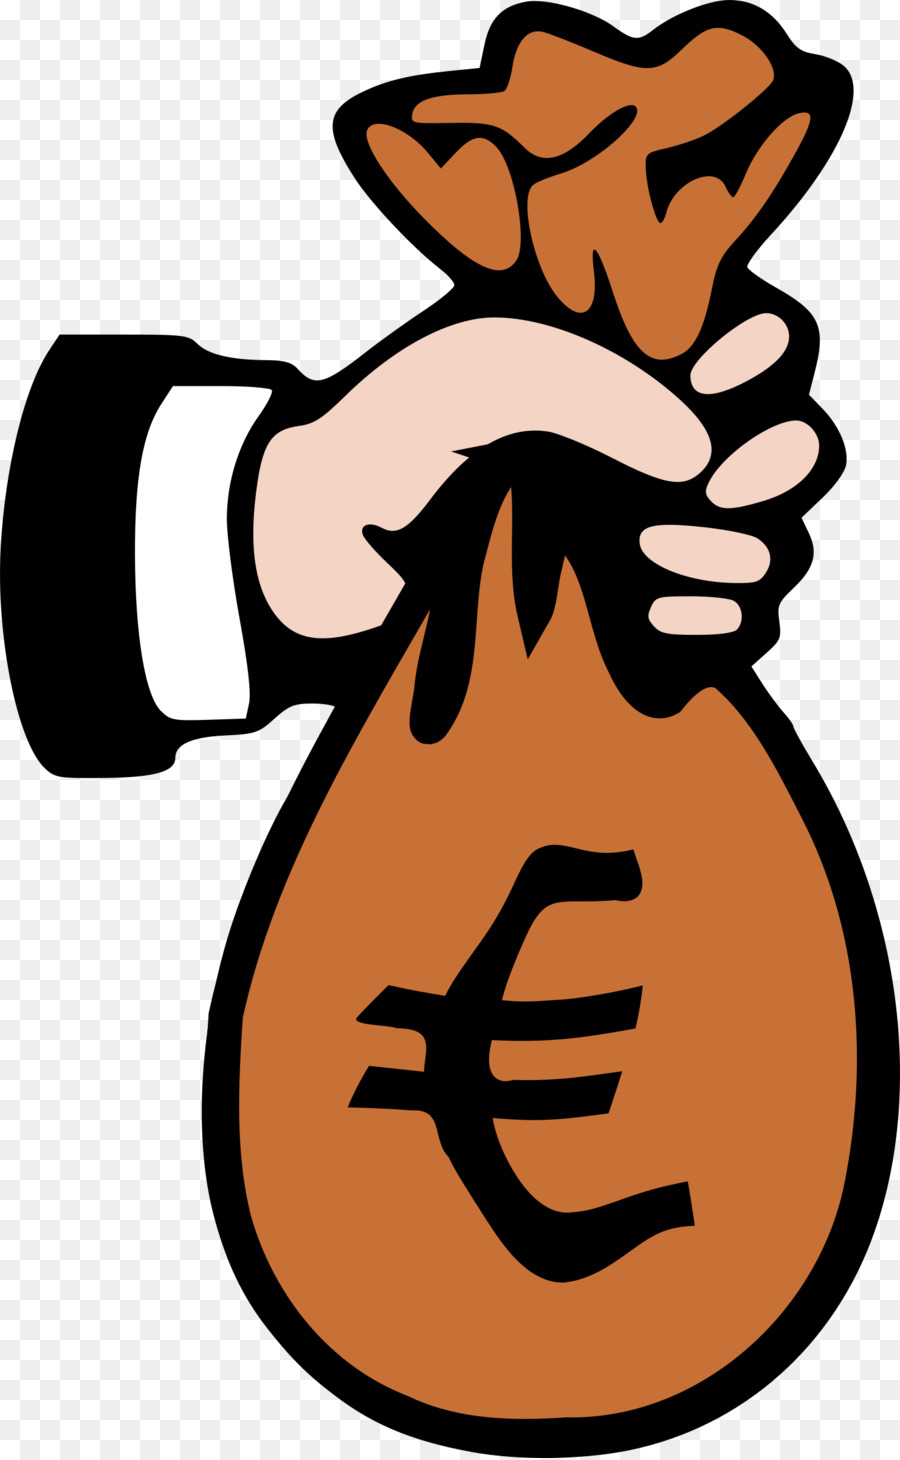 900x1460 Money Bag Clip Art